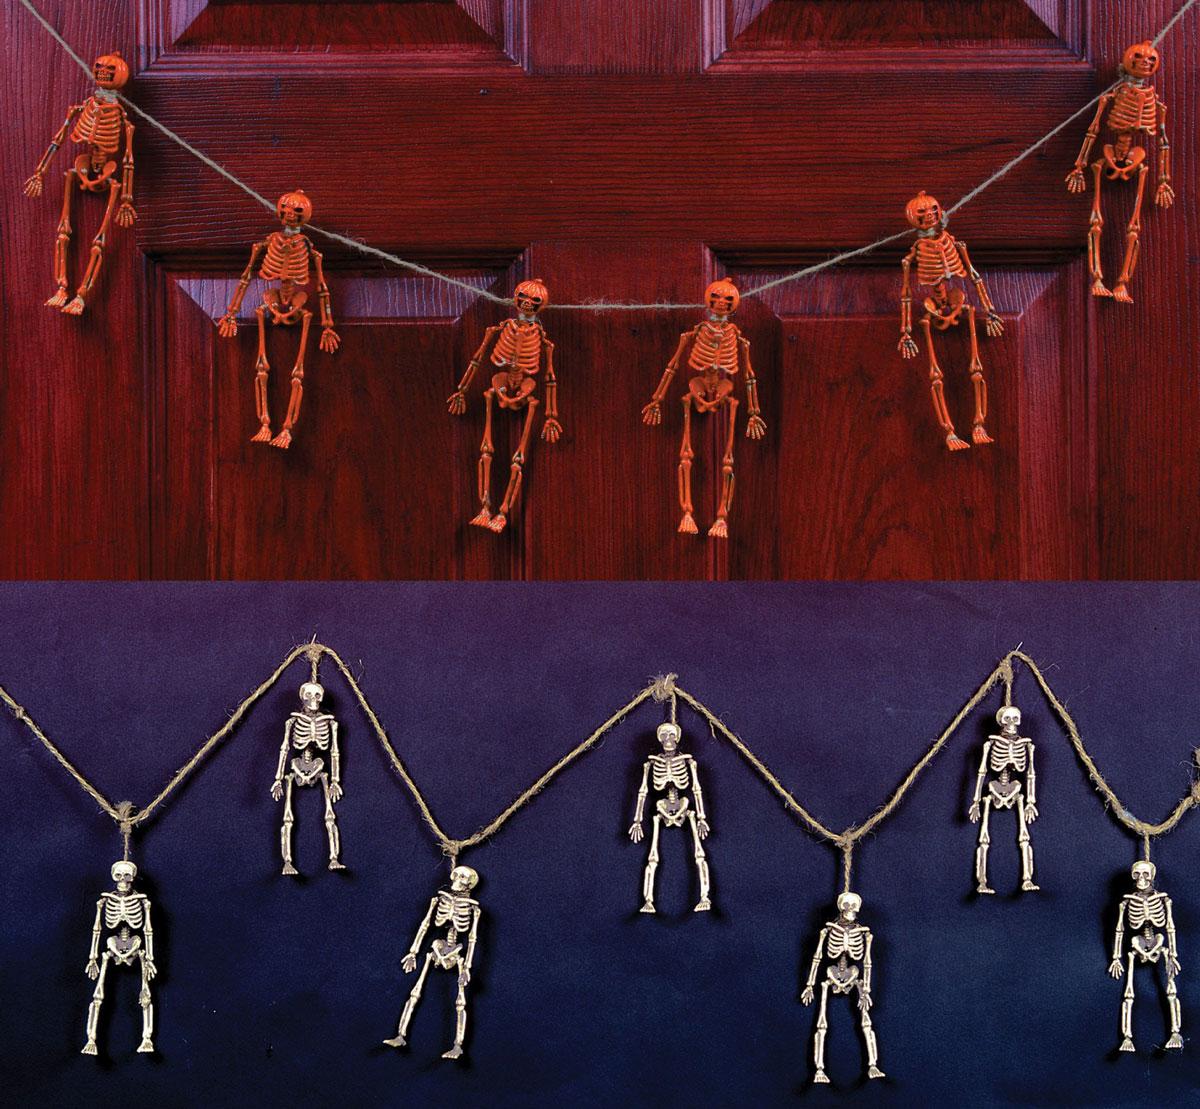 Hanging Skeleton Garland Scary Halloween Decoration Prop Decor